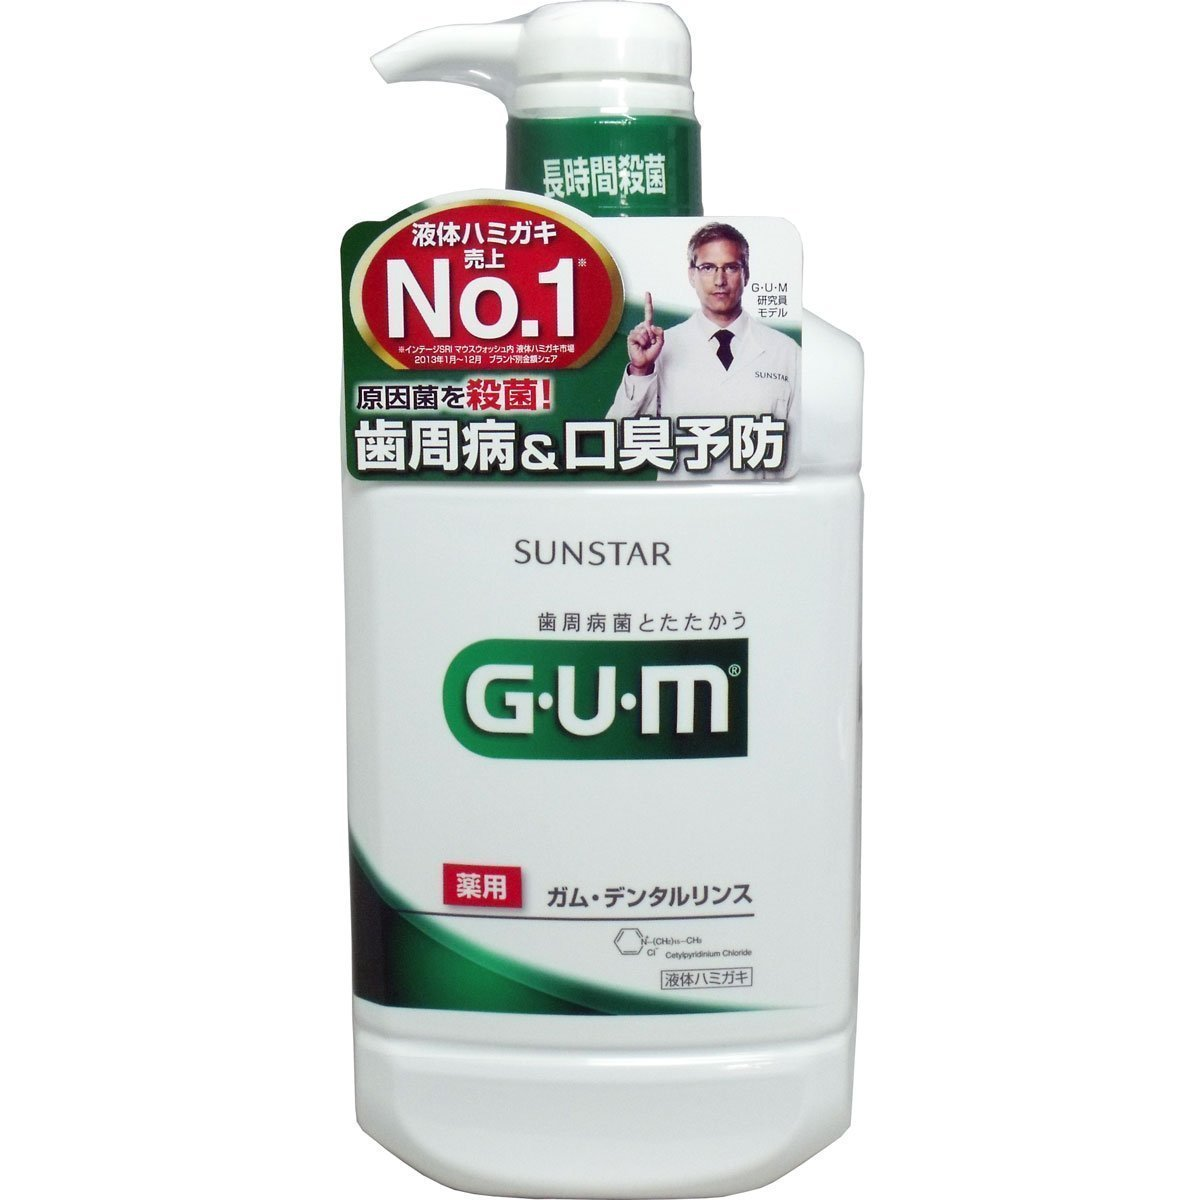 GUM デンタルリンス レギュラータイプ